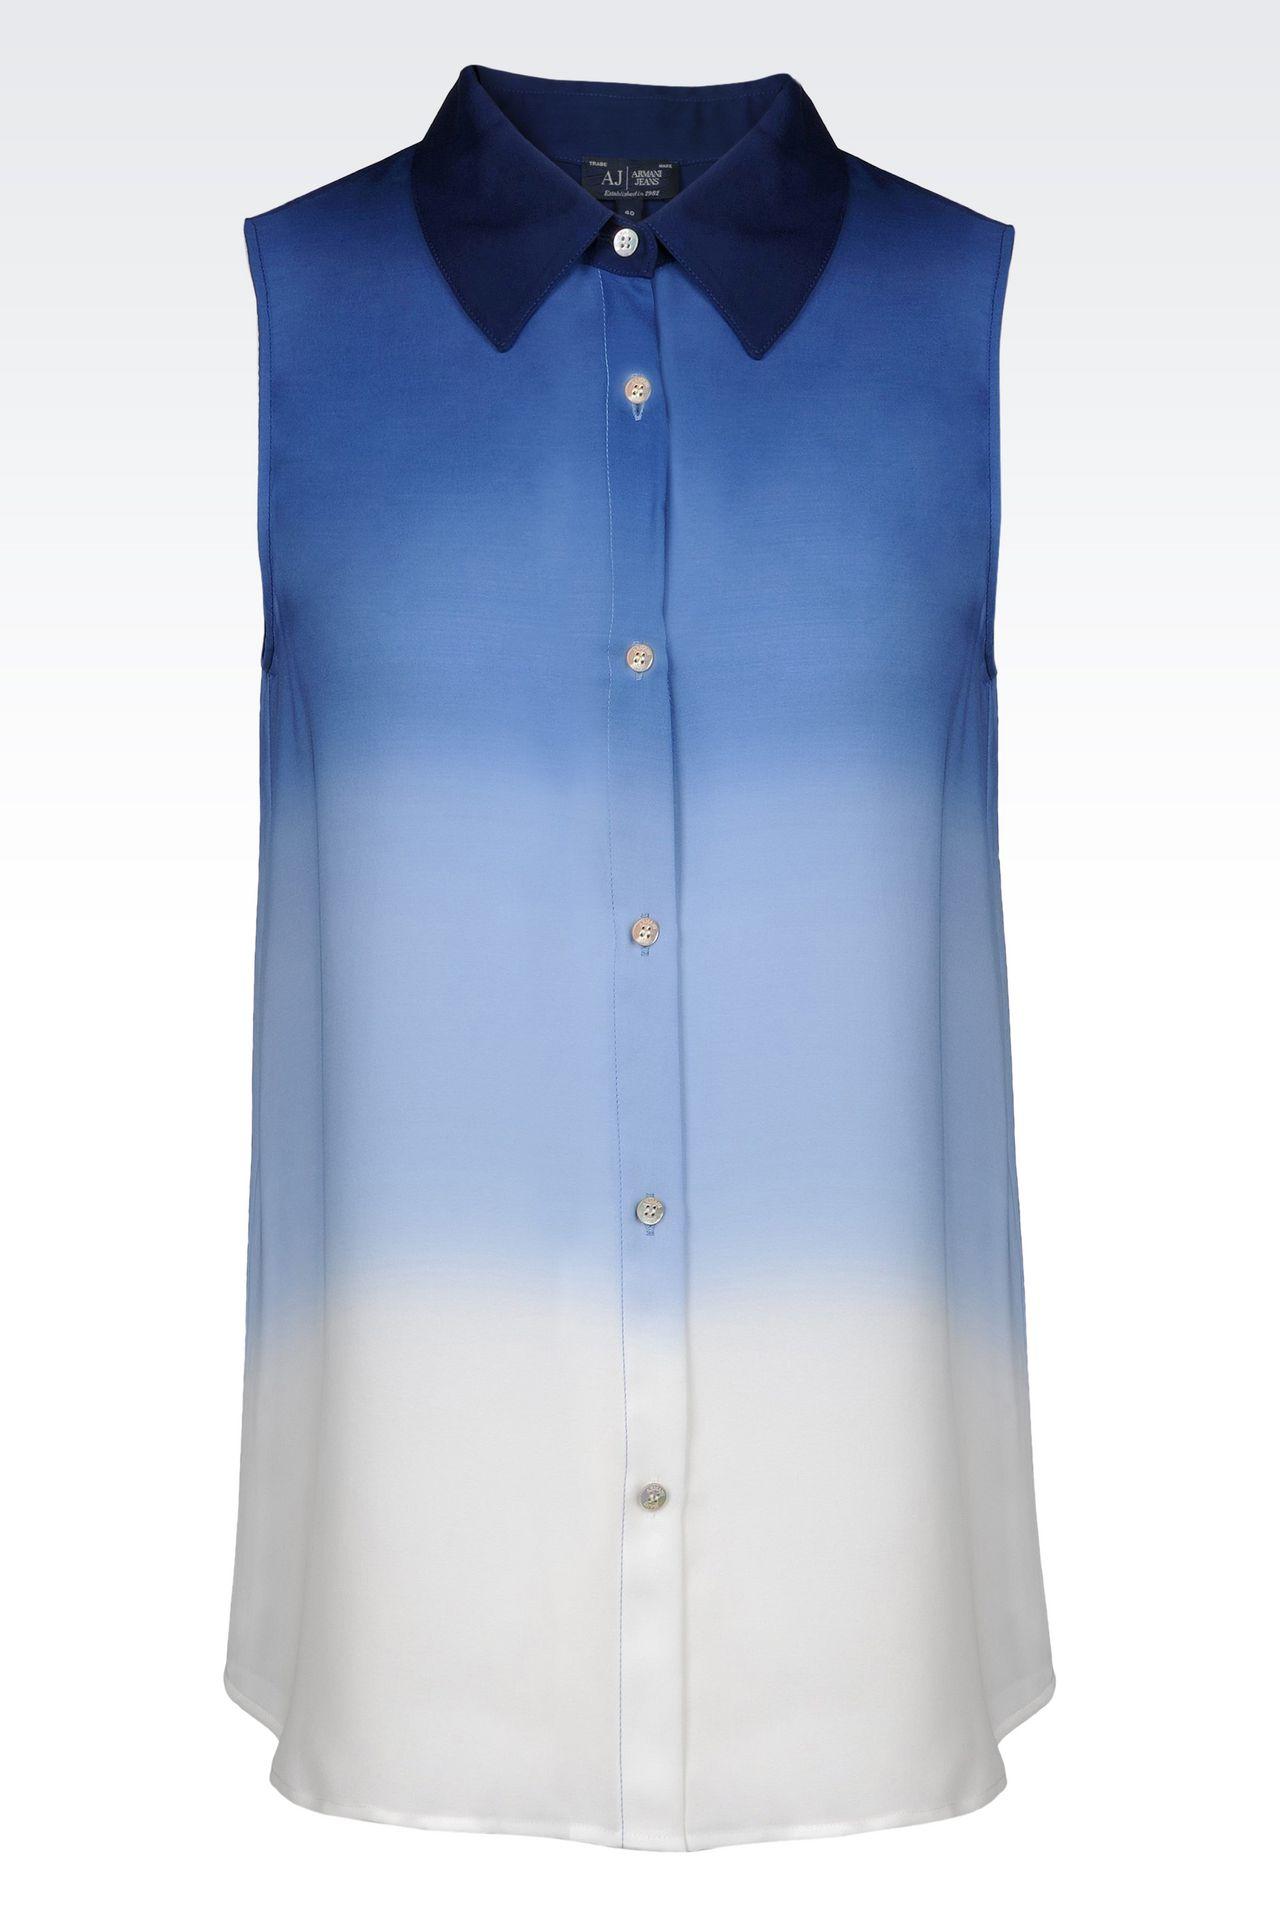 SHIRT IN TIE-DYE EFFECT SILK: Sleeveless shirts Women by Armani - 0